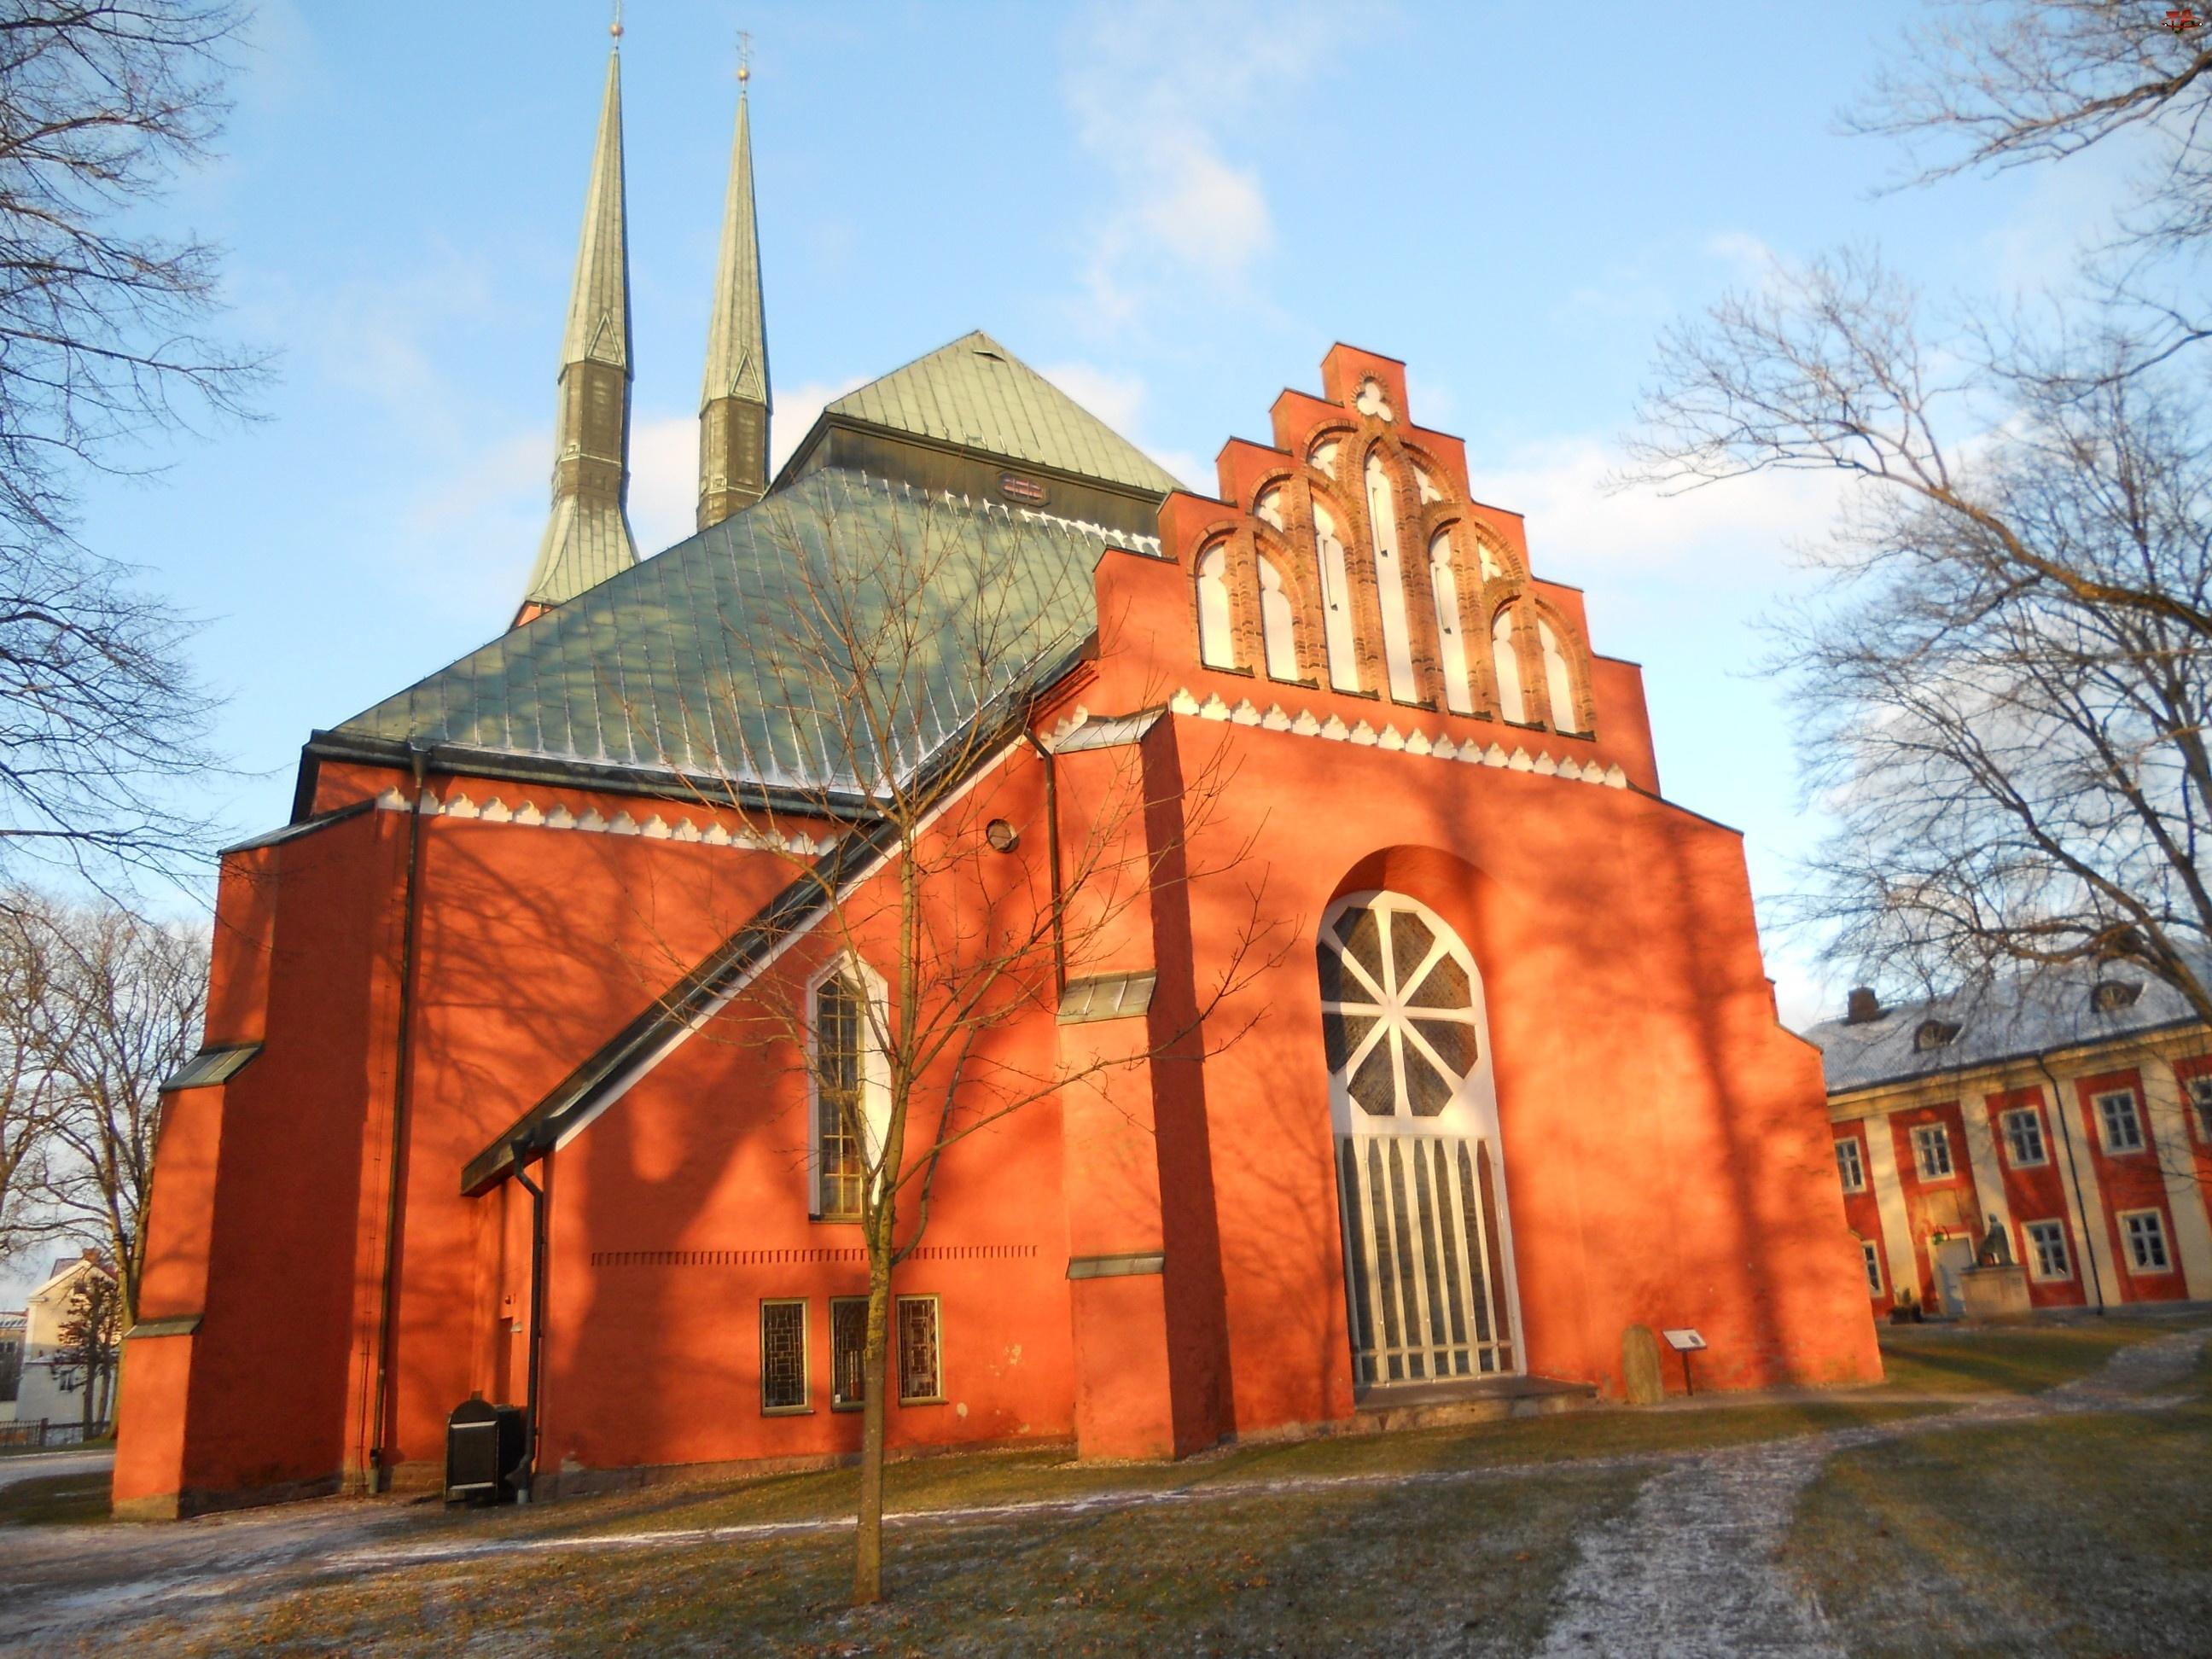 Kościoły, Szwecja Växjö, Zabytki, Budowle